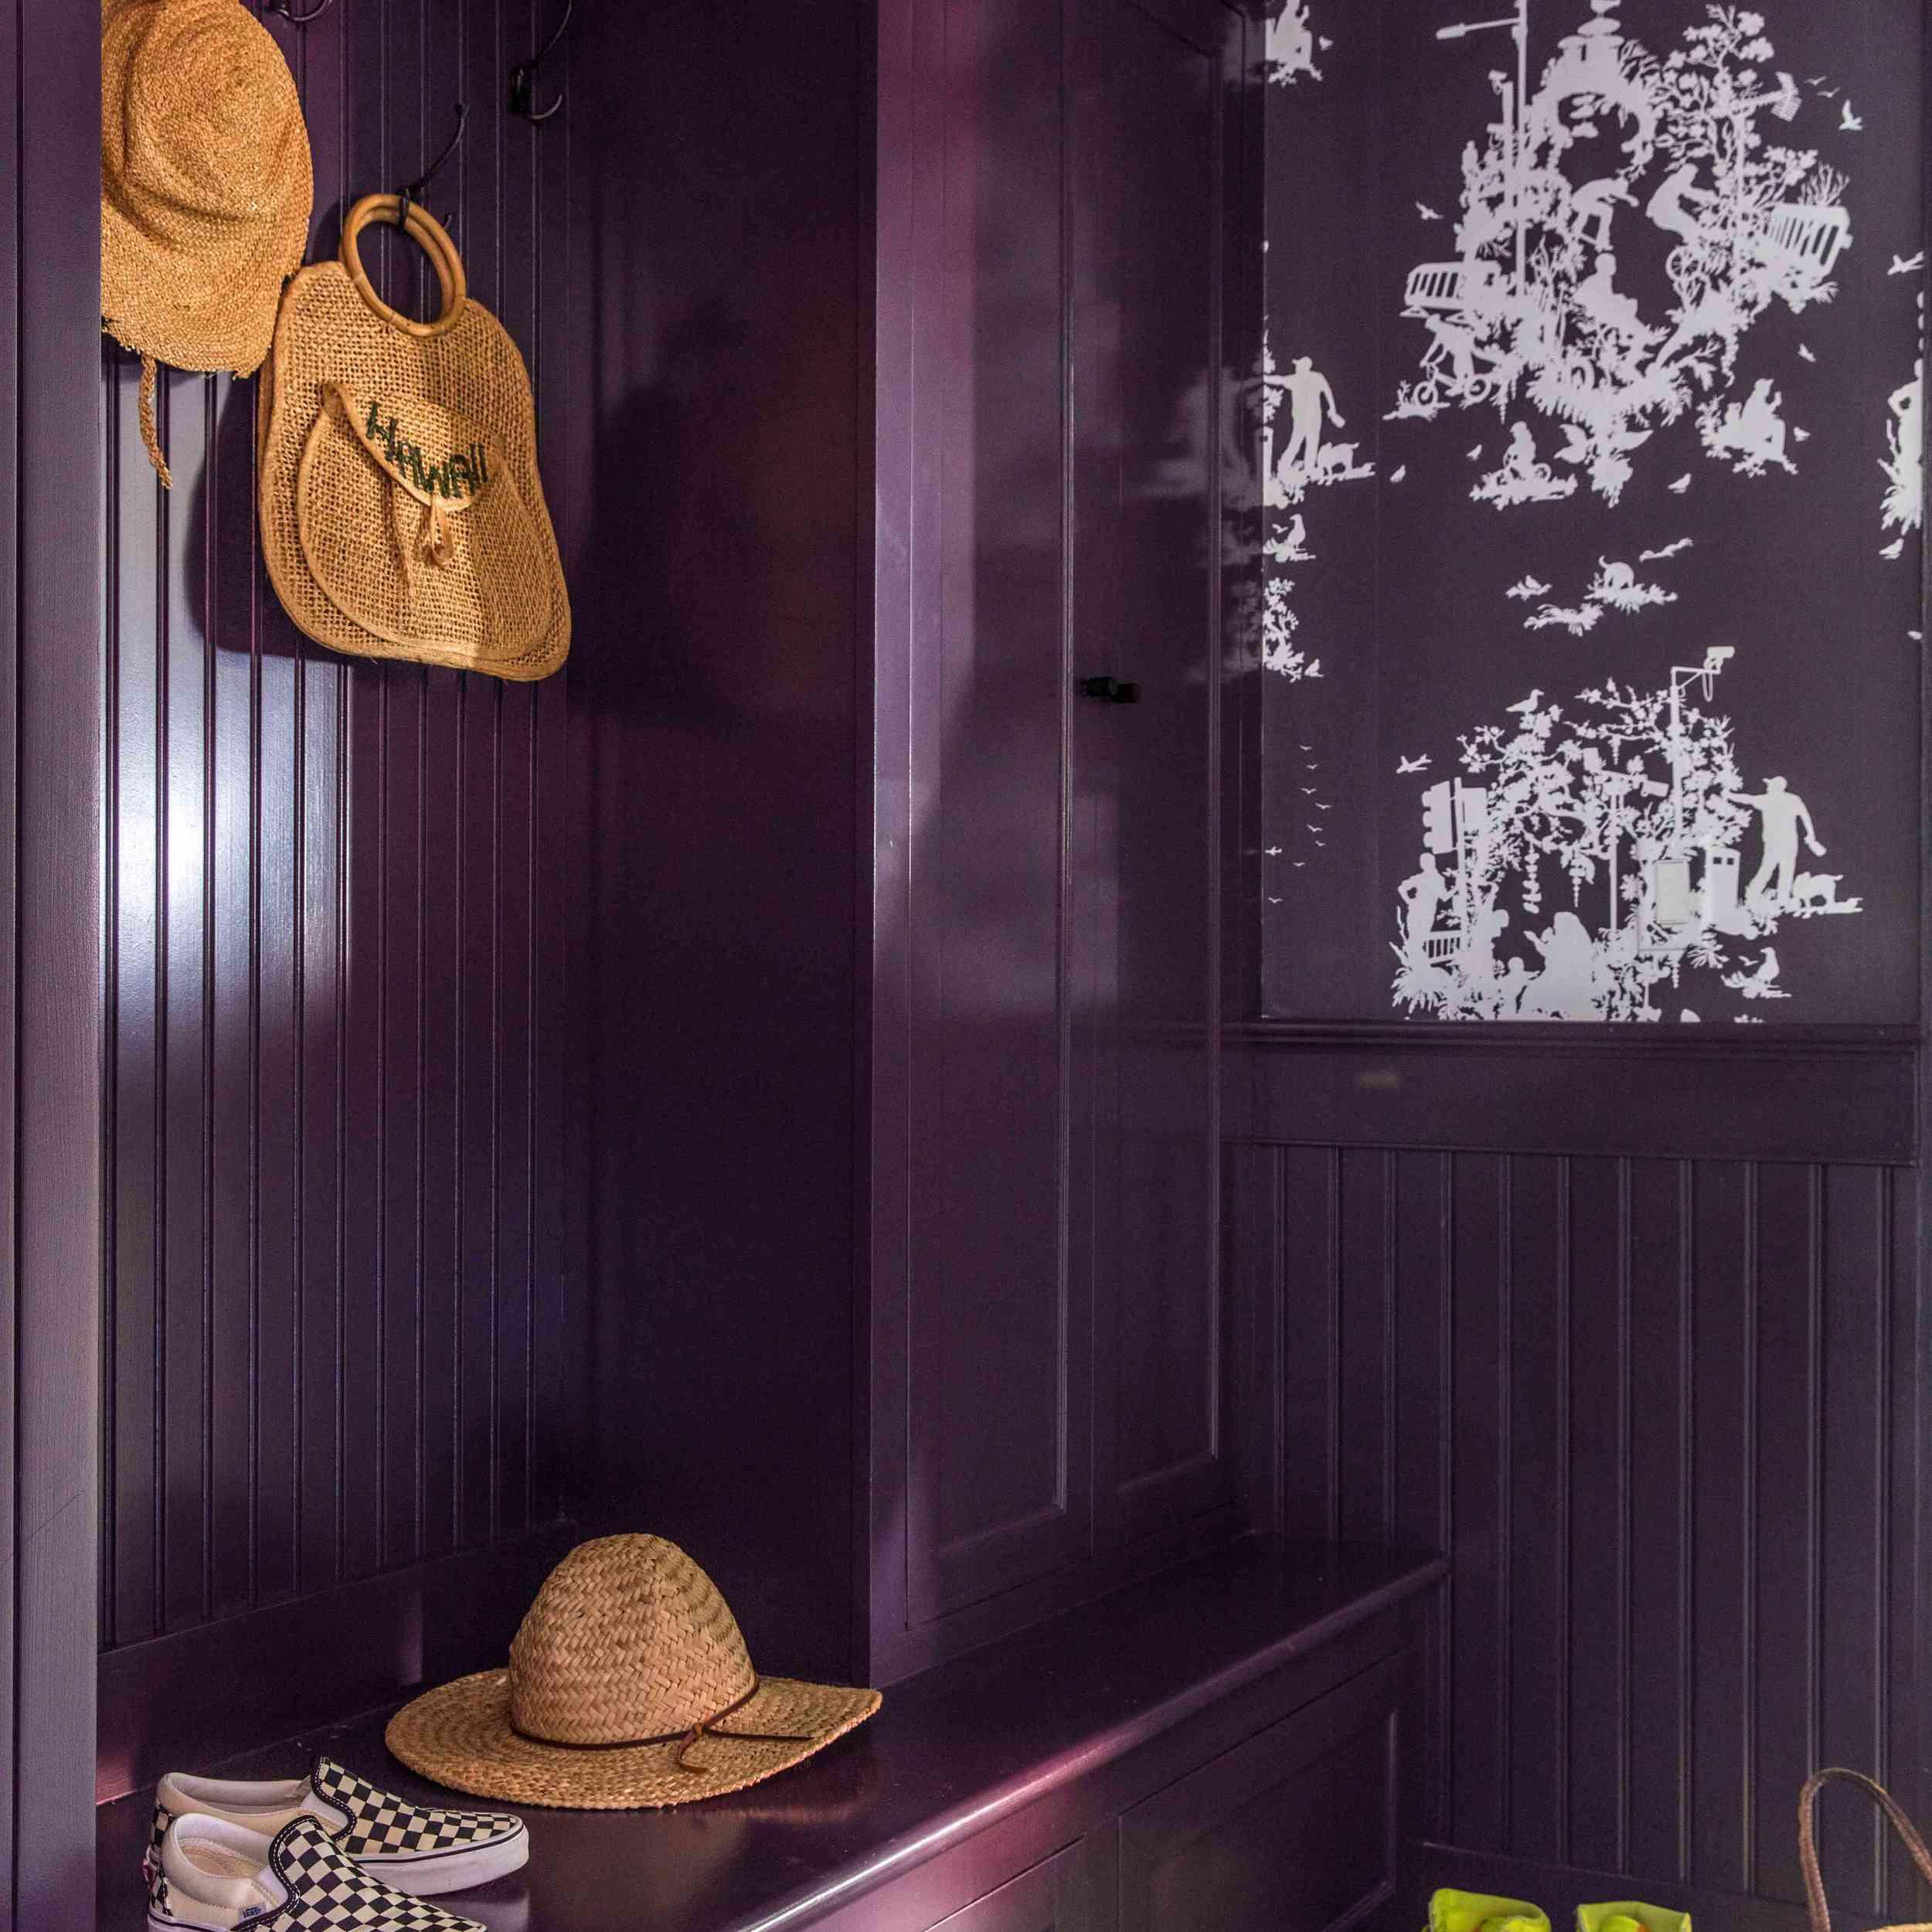 Mudroom with purple wood panelling